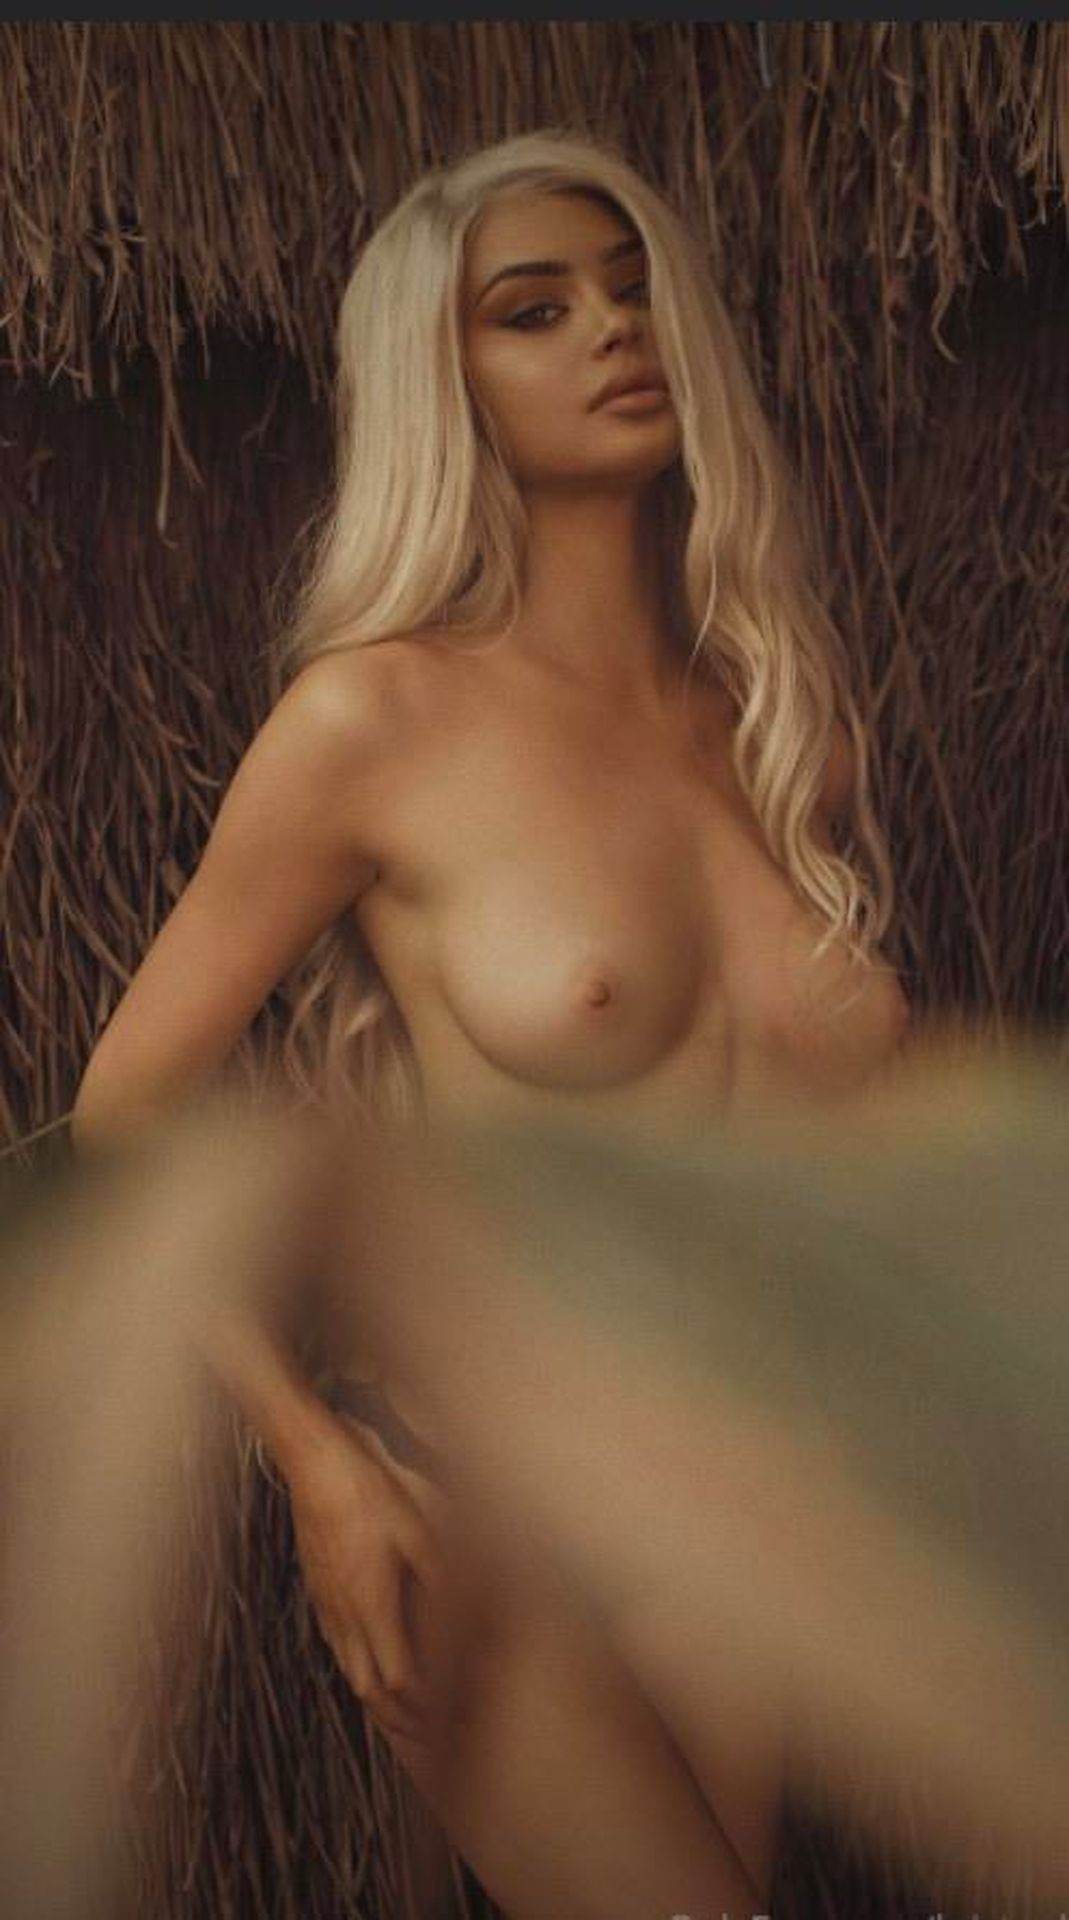 Kristen Hancher, Onlyfans Nudes Leaks 0046